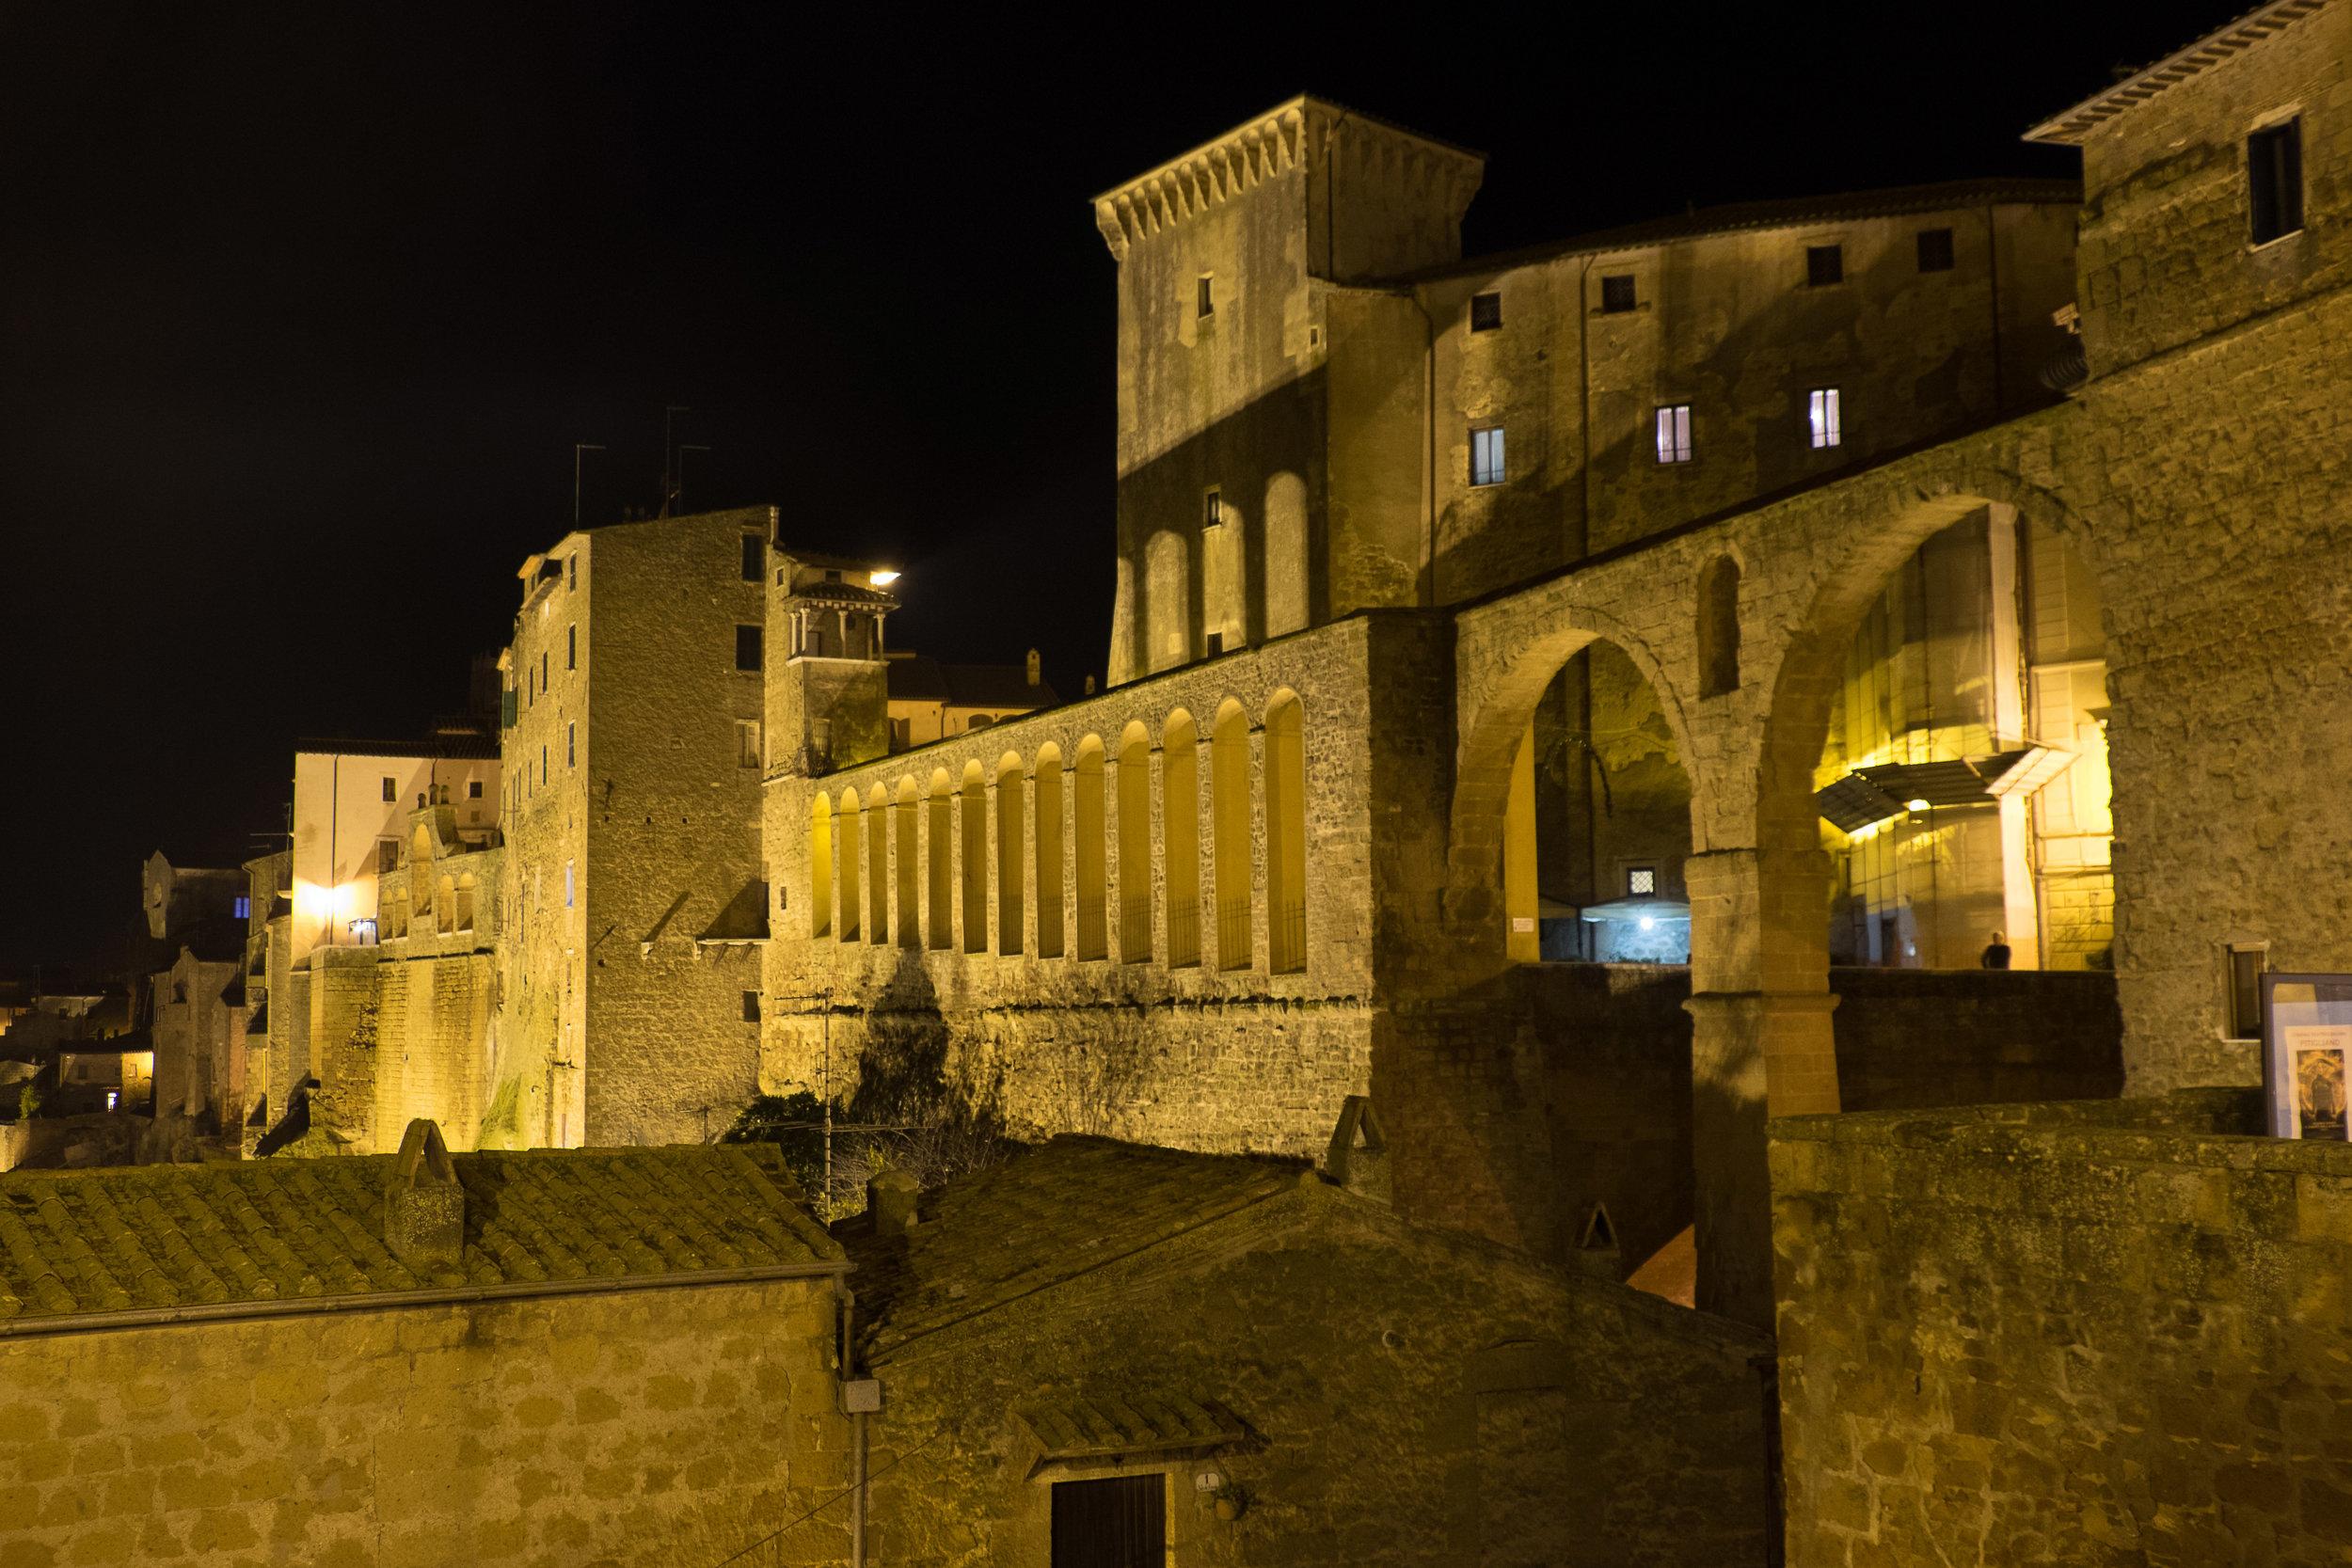 Pitigliano by night, Tuscany | ©John Szabo (published by Jacqui Small)